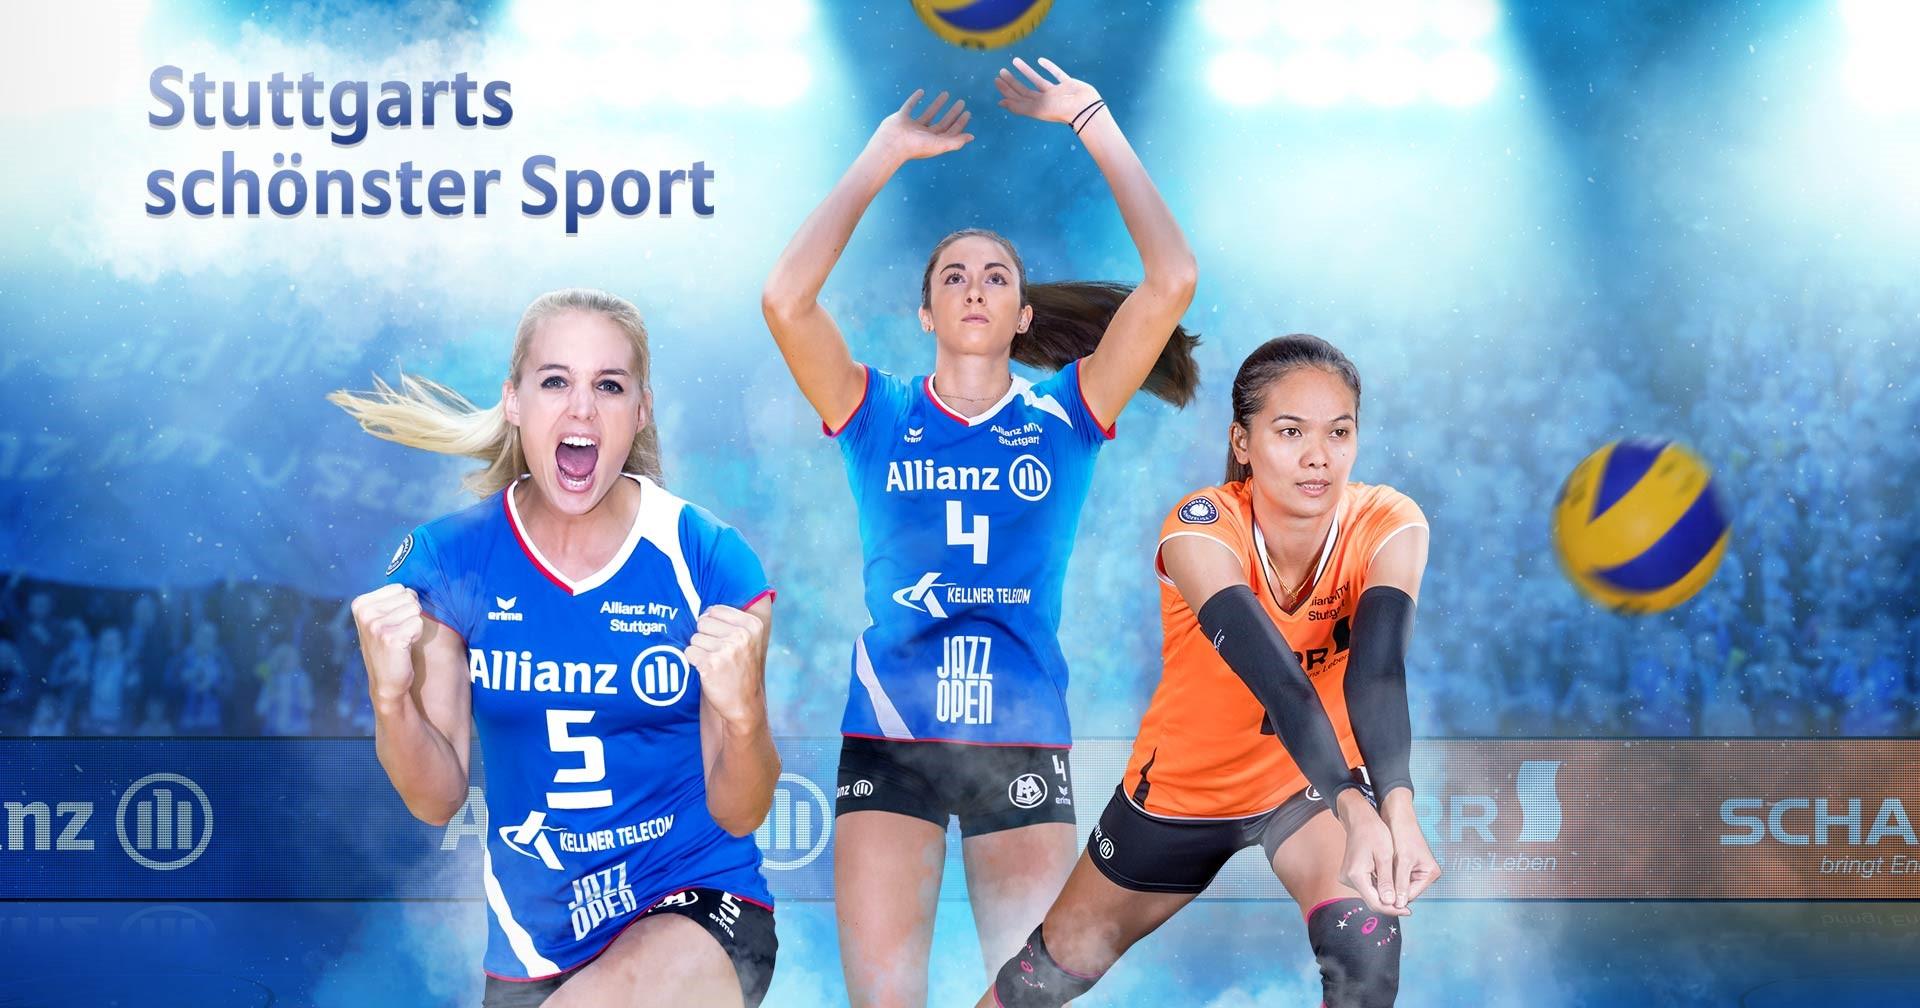 Allianz Saisonmotiv 2016/17